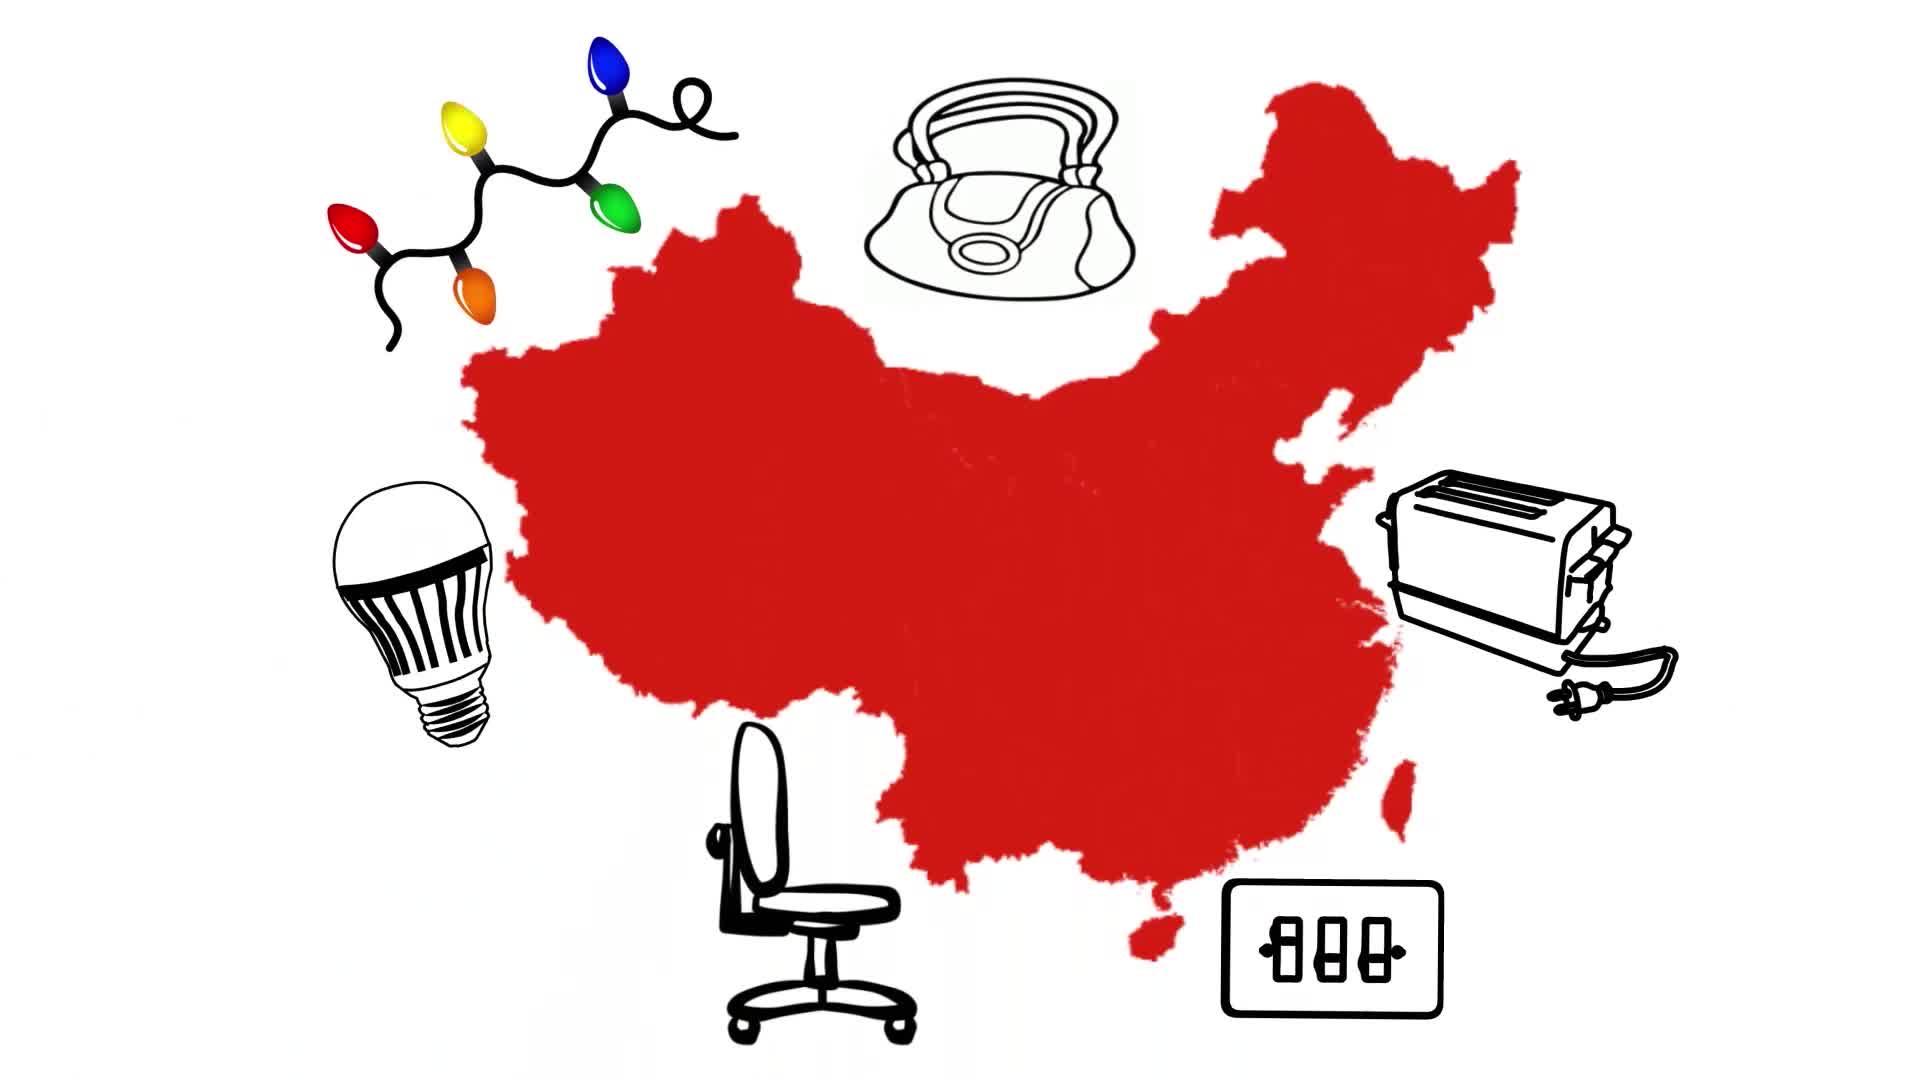 Китай третья вечерние PPI Pre-Production Inspection Services